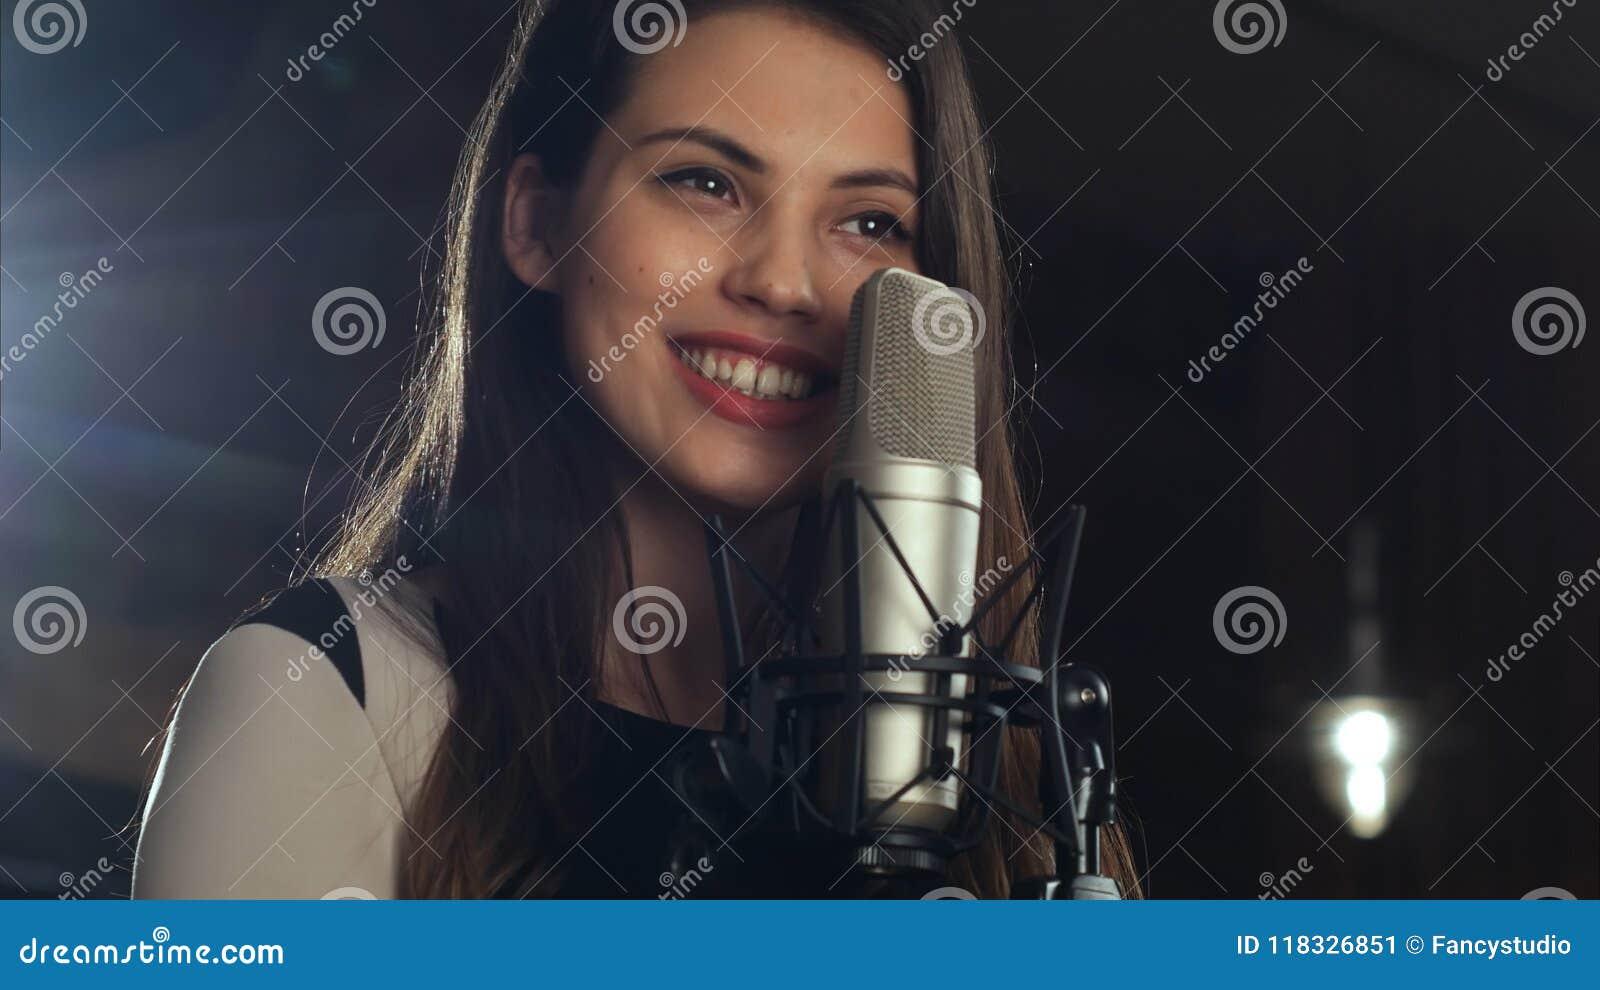 Human Mouth Singing Microphone Singer Stock Photos